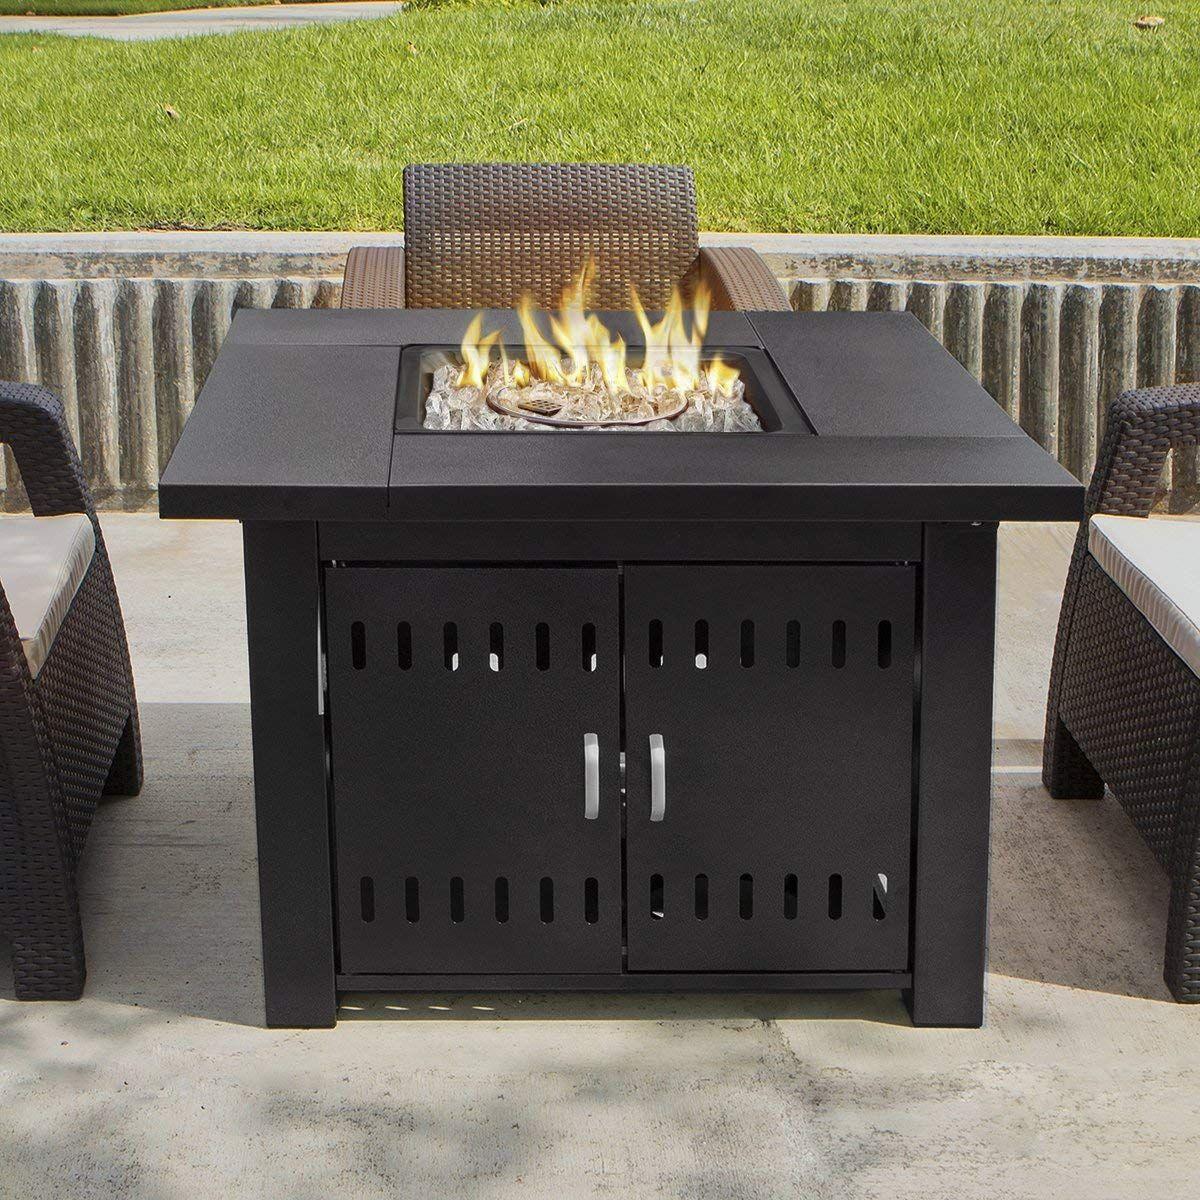 Xtremepowerus Out Door Patio Heaters Lpg Propane Fire Pit Table Black Propane Fire Pit Table Fire Pit Table Patio Heater